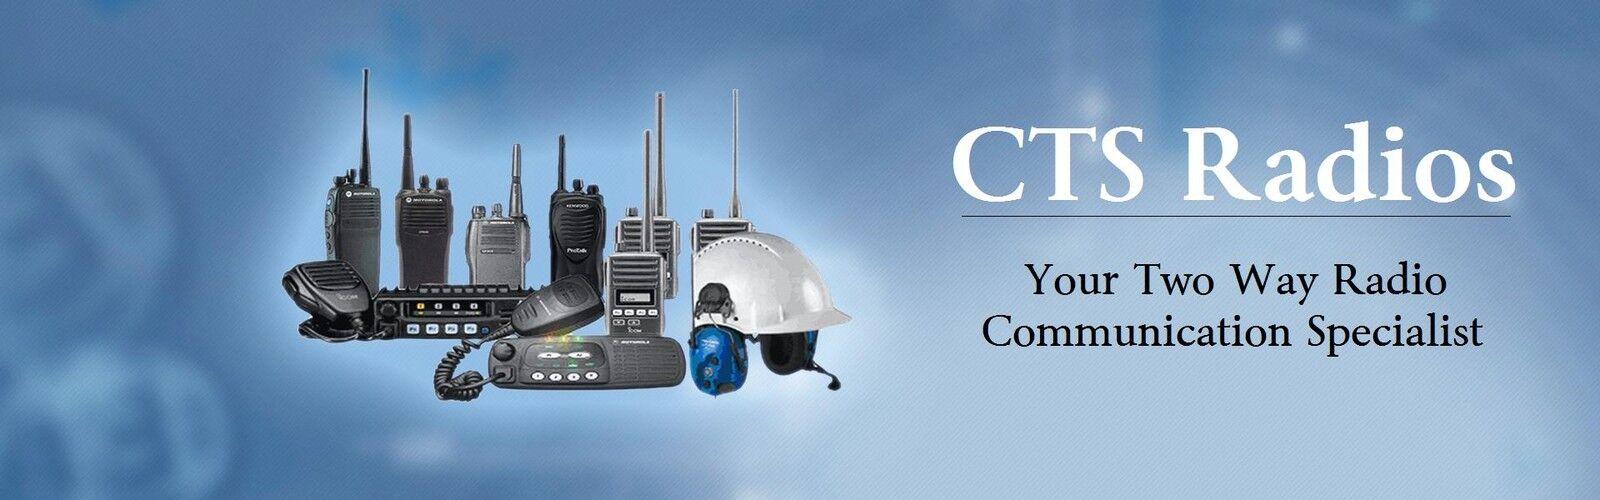 CTS Radios